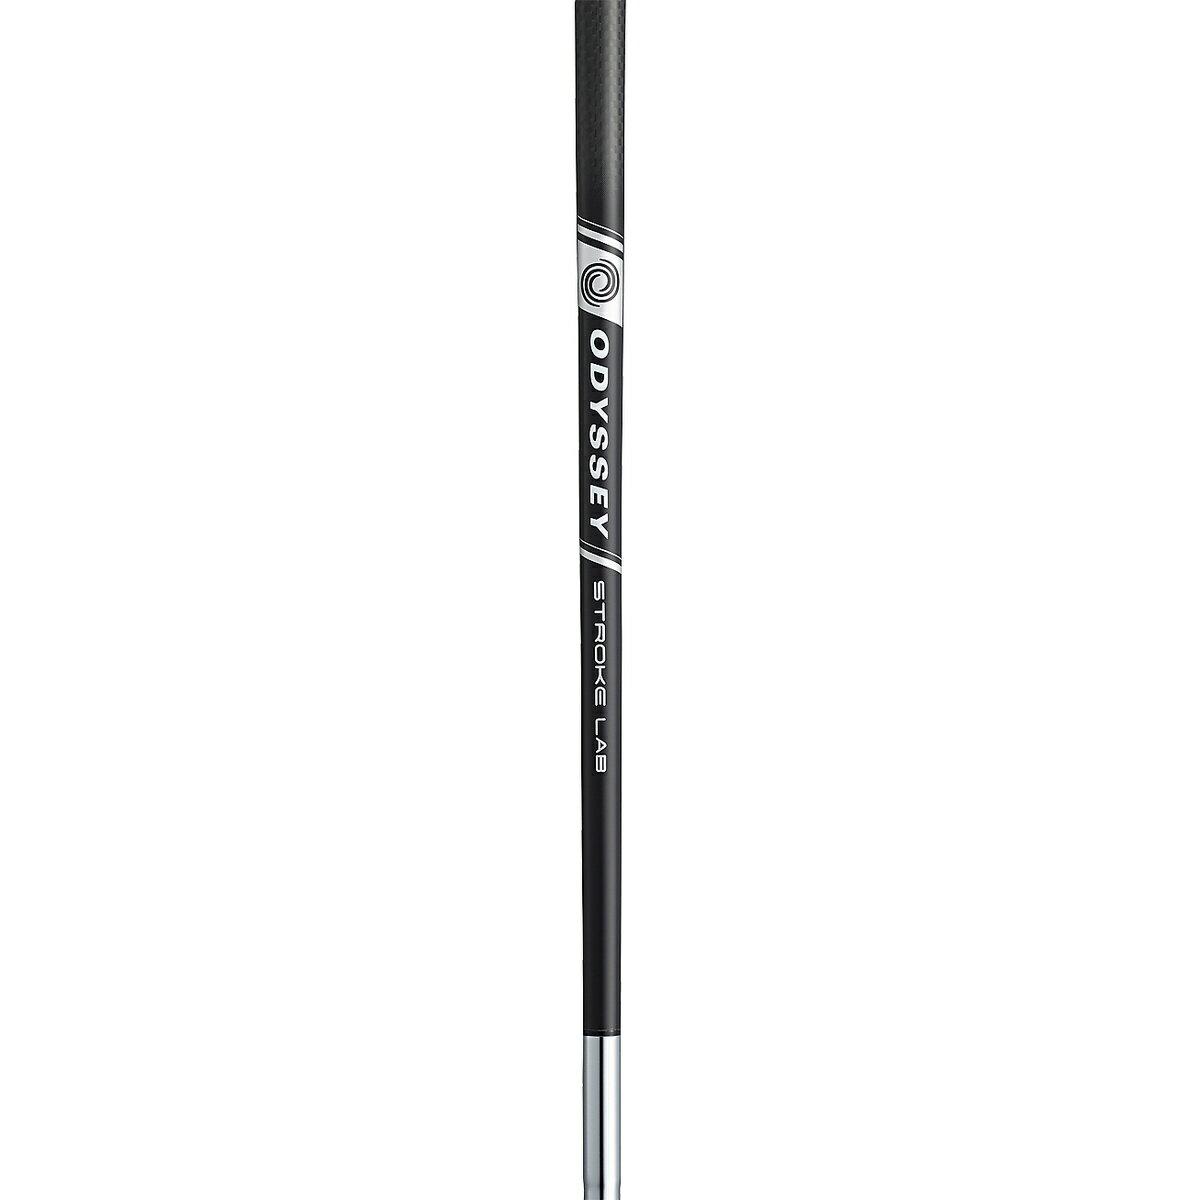 Callaway (キャロウェイ) ゴルフ パター PT RH OD STROKE LAB 19 ONE OS 34 JV メンズ 73091242534010